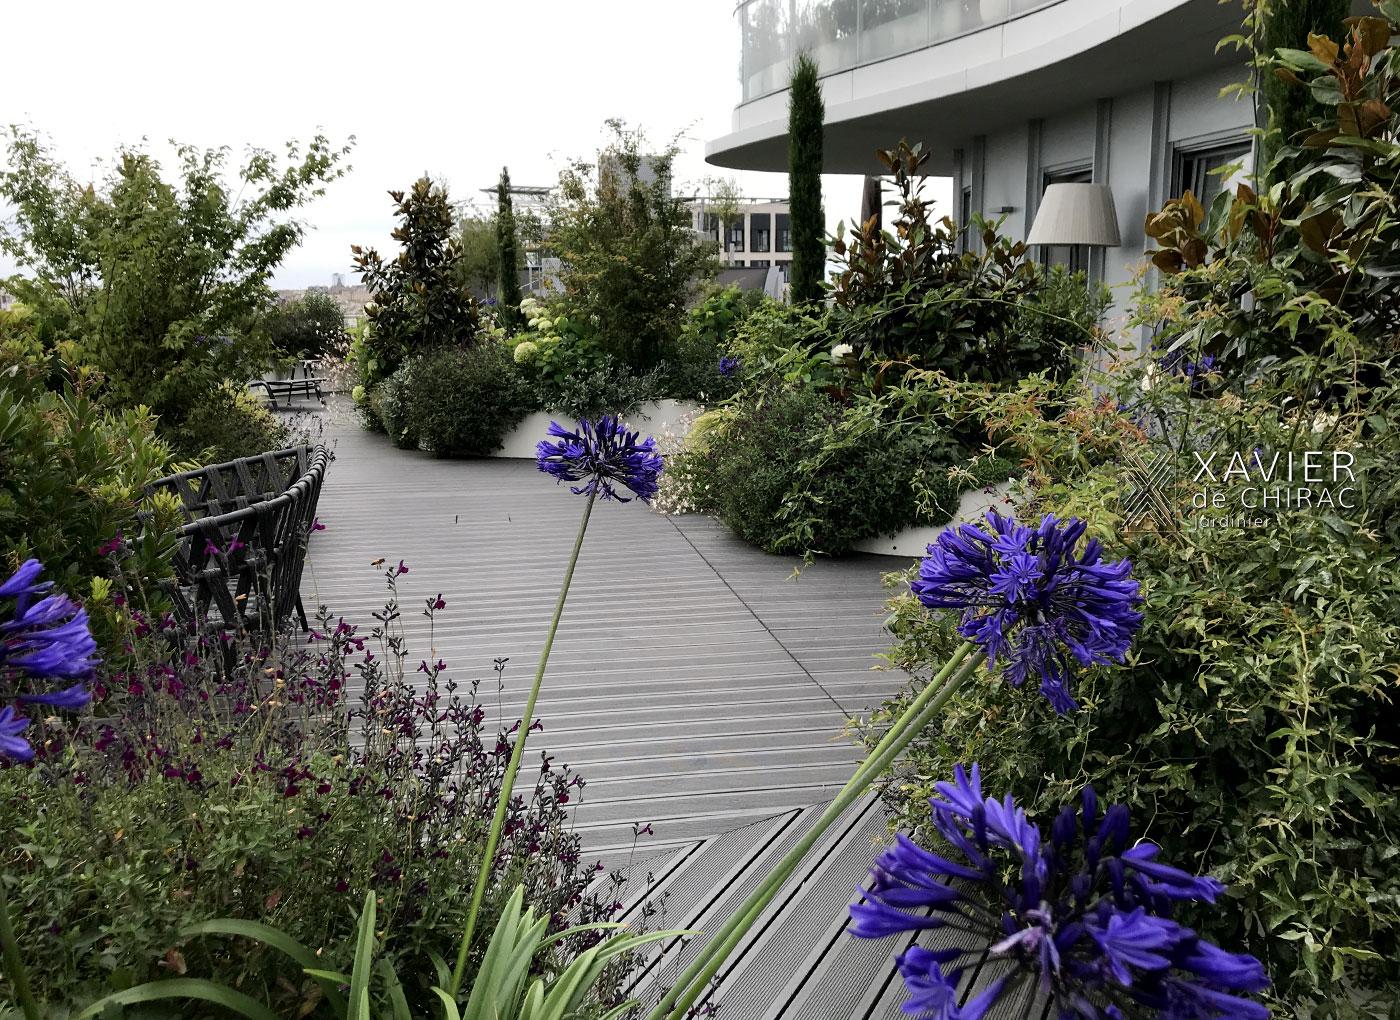 jardin d'ancien atelier xavier de chirac jardinier